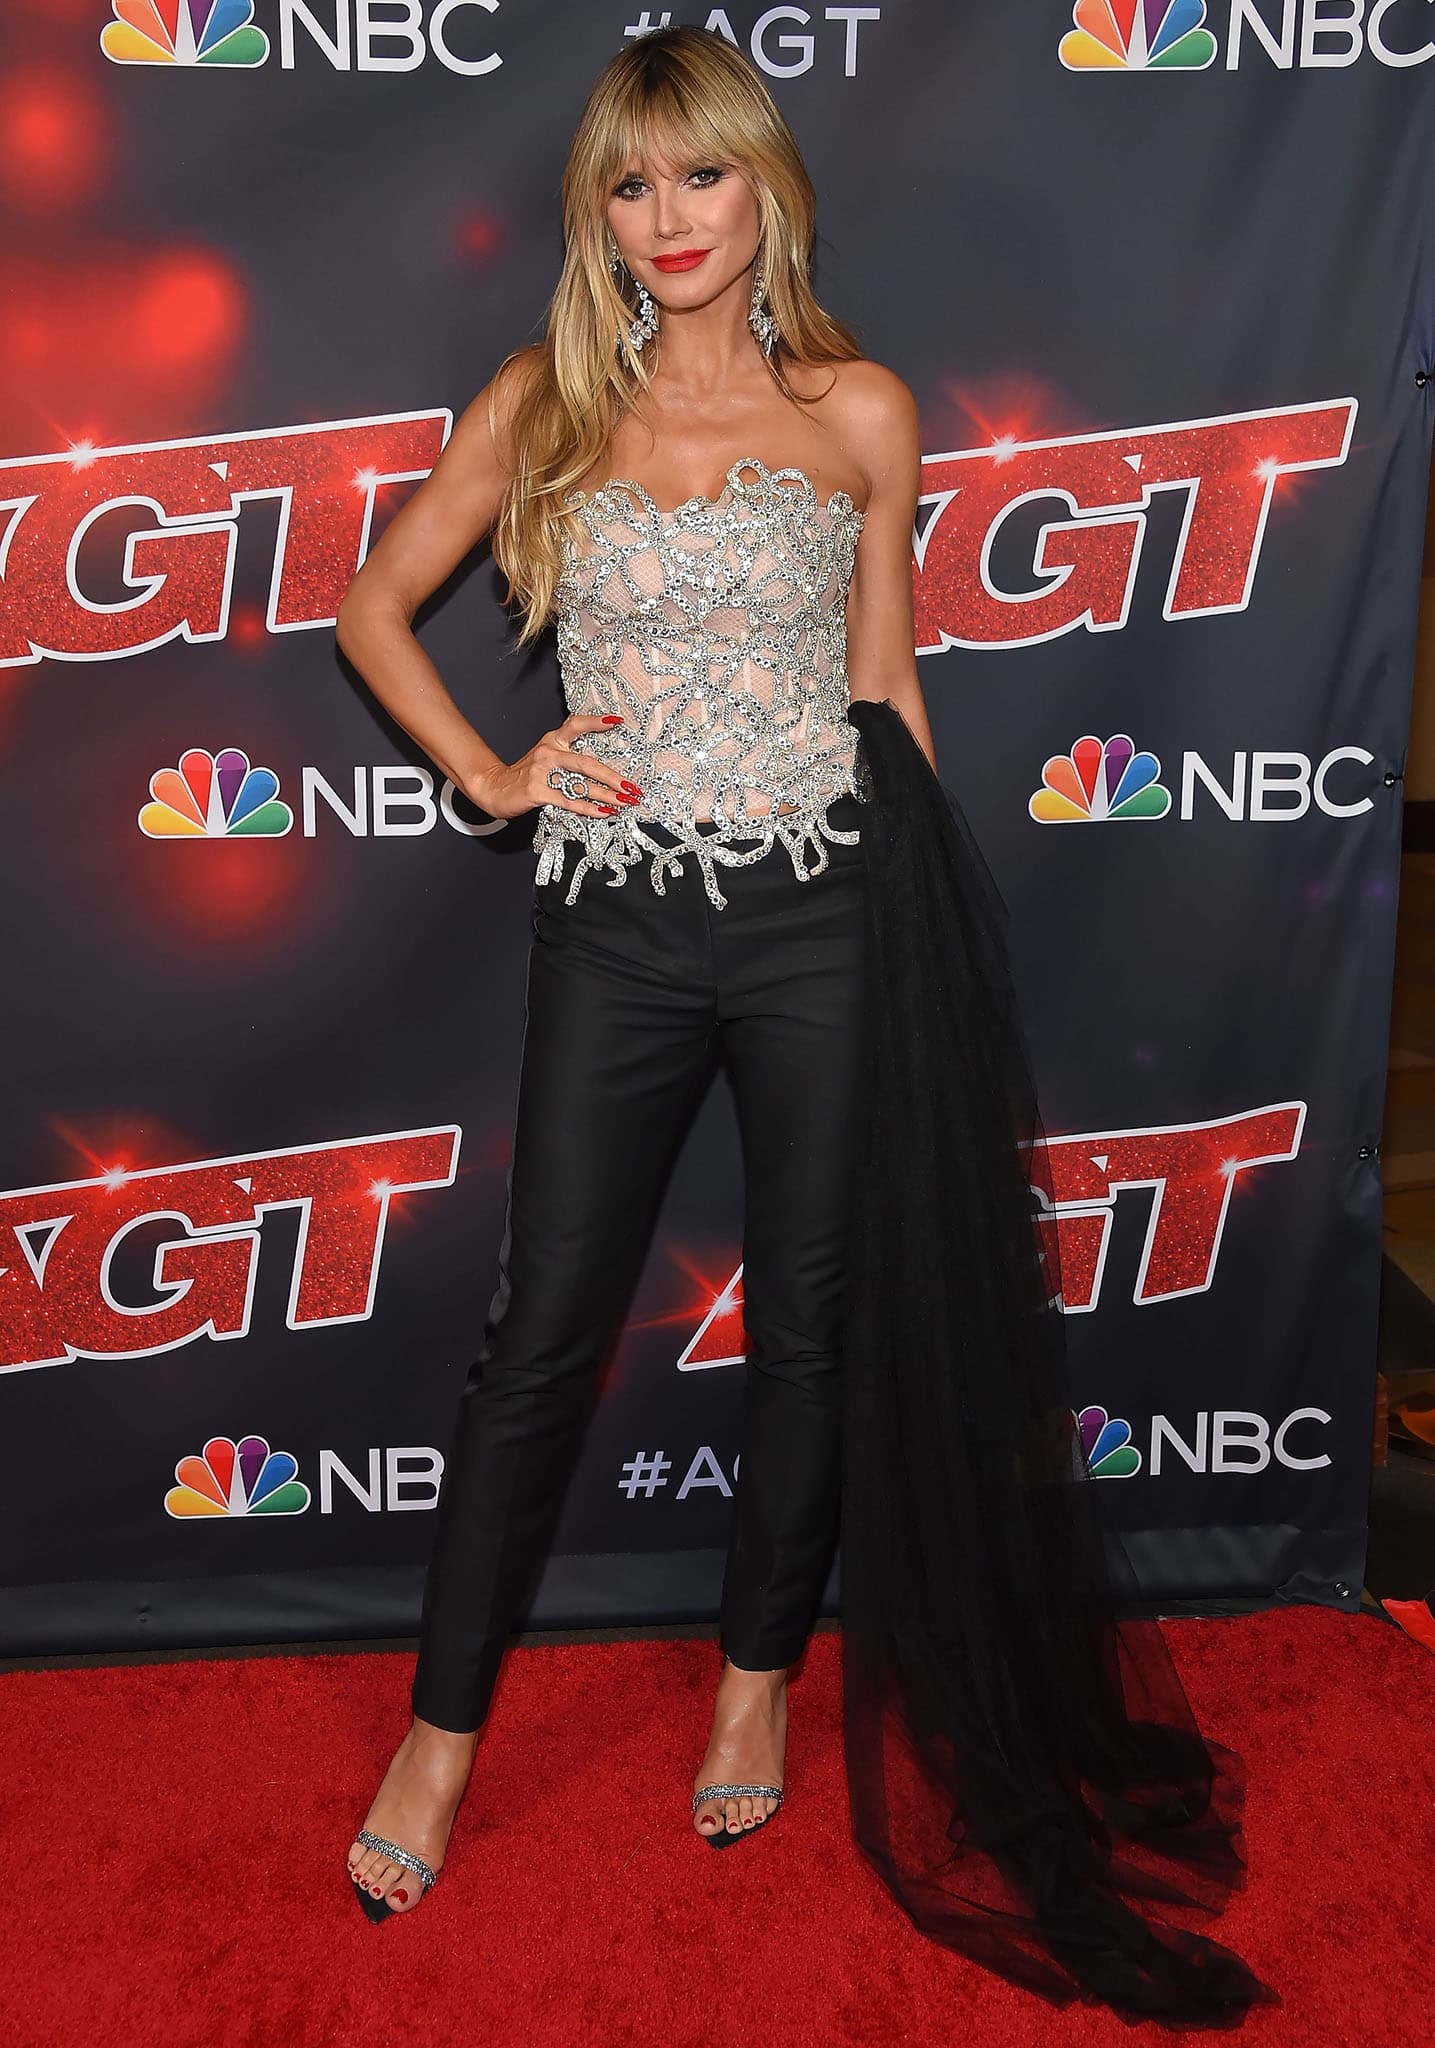 Heidi Klum wears an Oscar de la Renta corset-style top with slim-fit black trousers